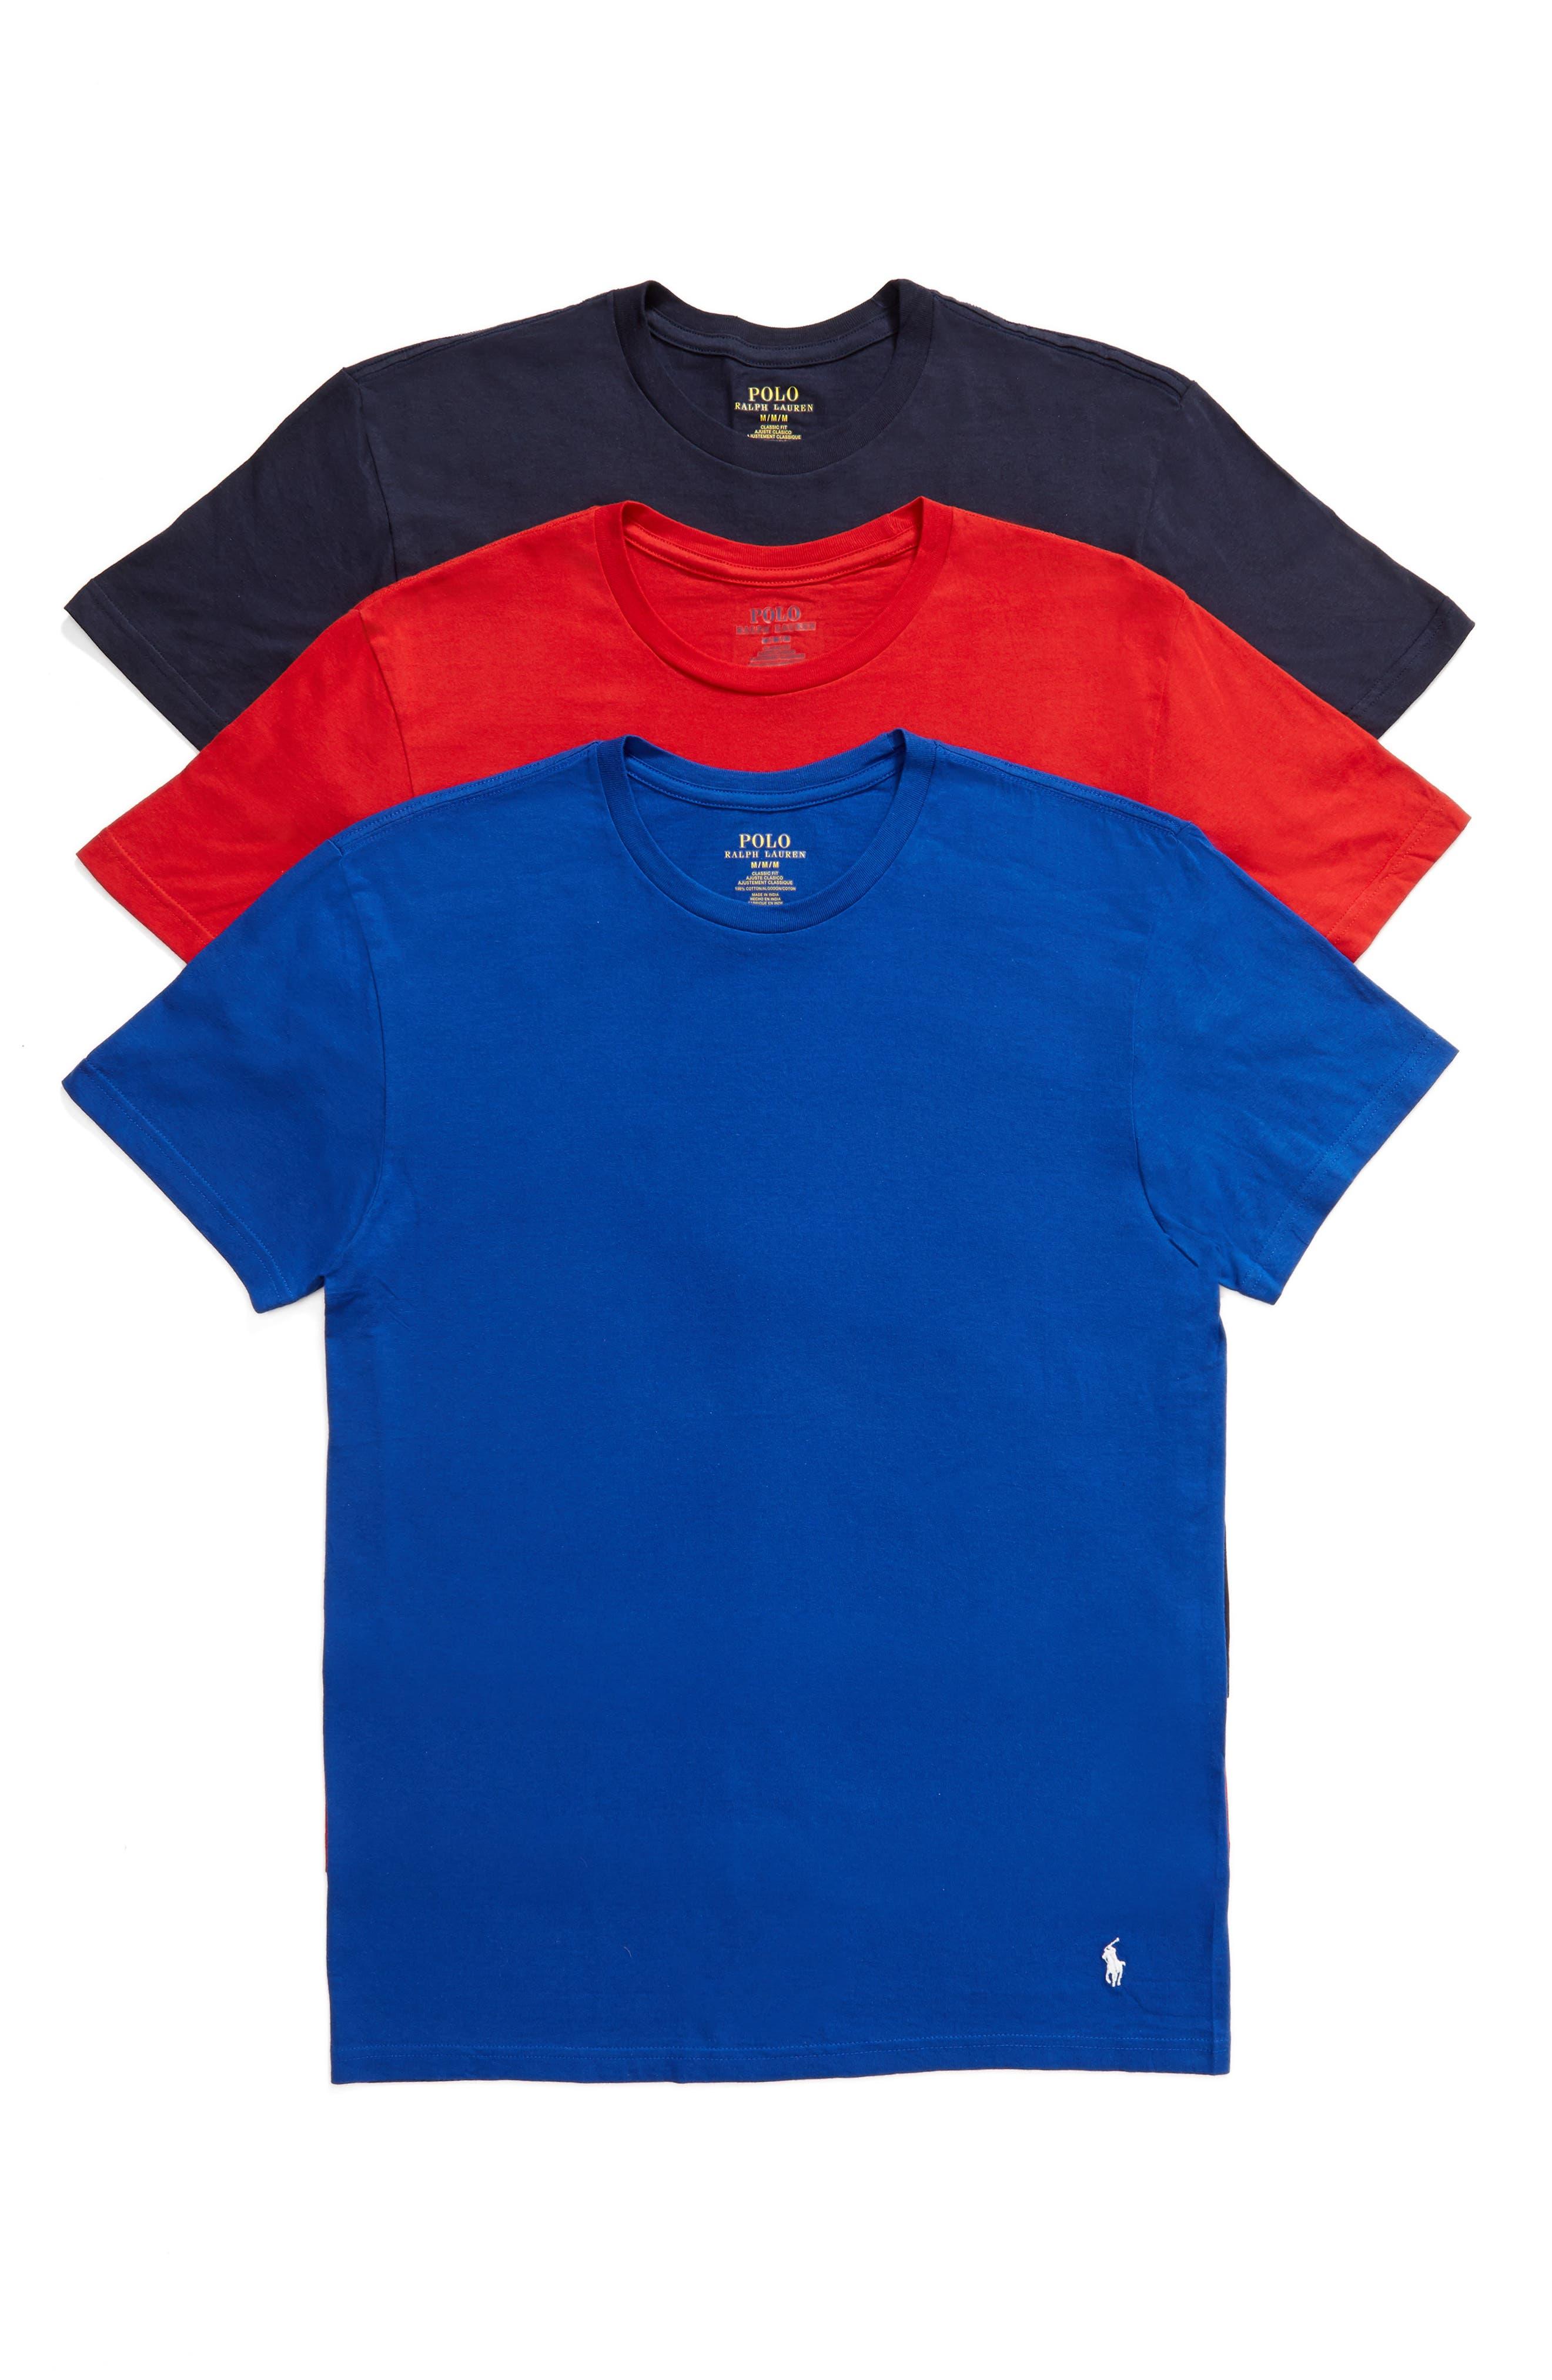 POLO RALPH LAUREN, 3-Pack Crewneck T-Shirts, Main thumbnail 1, color, CRUISE ROYAL/ RED/ CRUISE NAVY